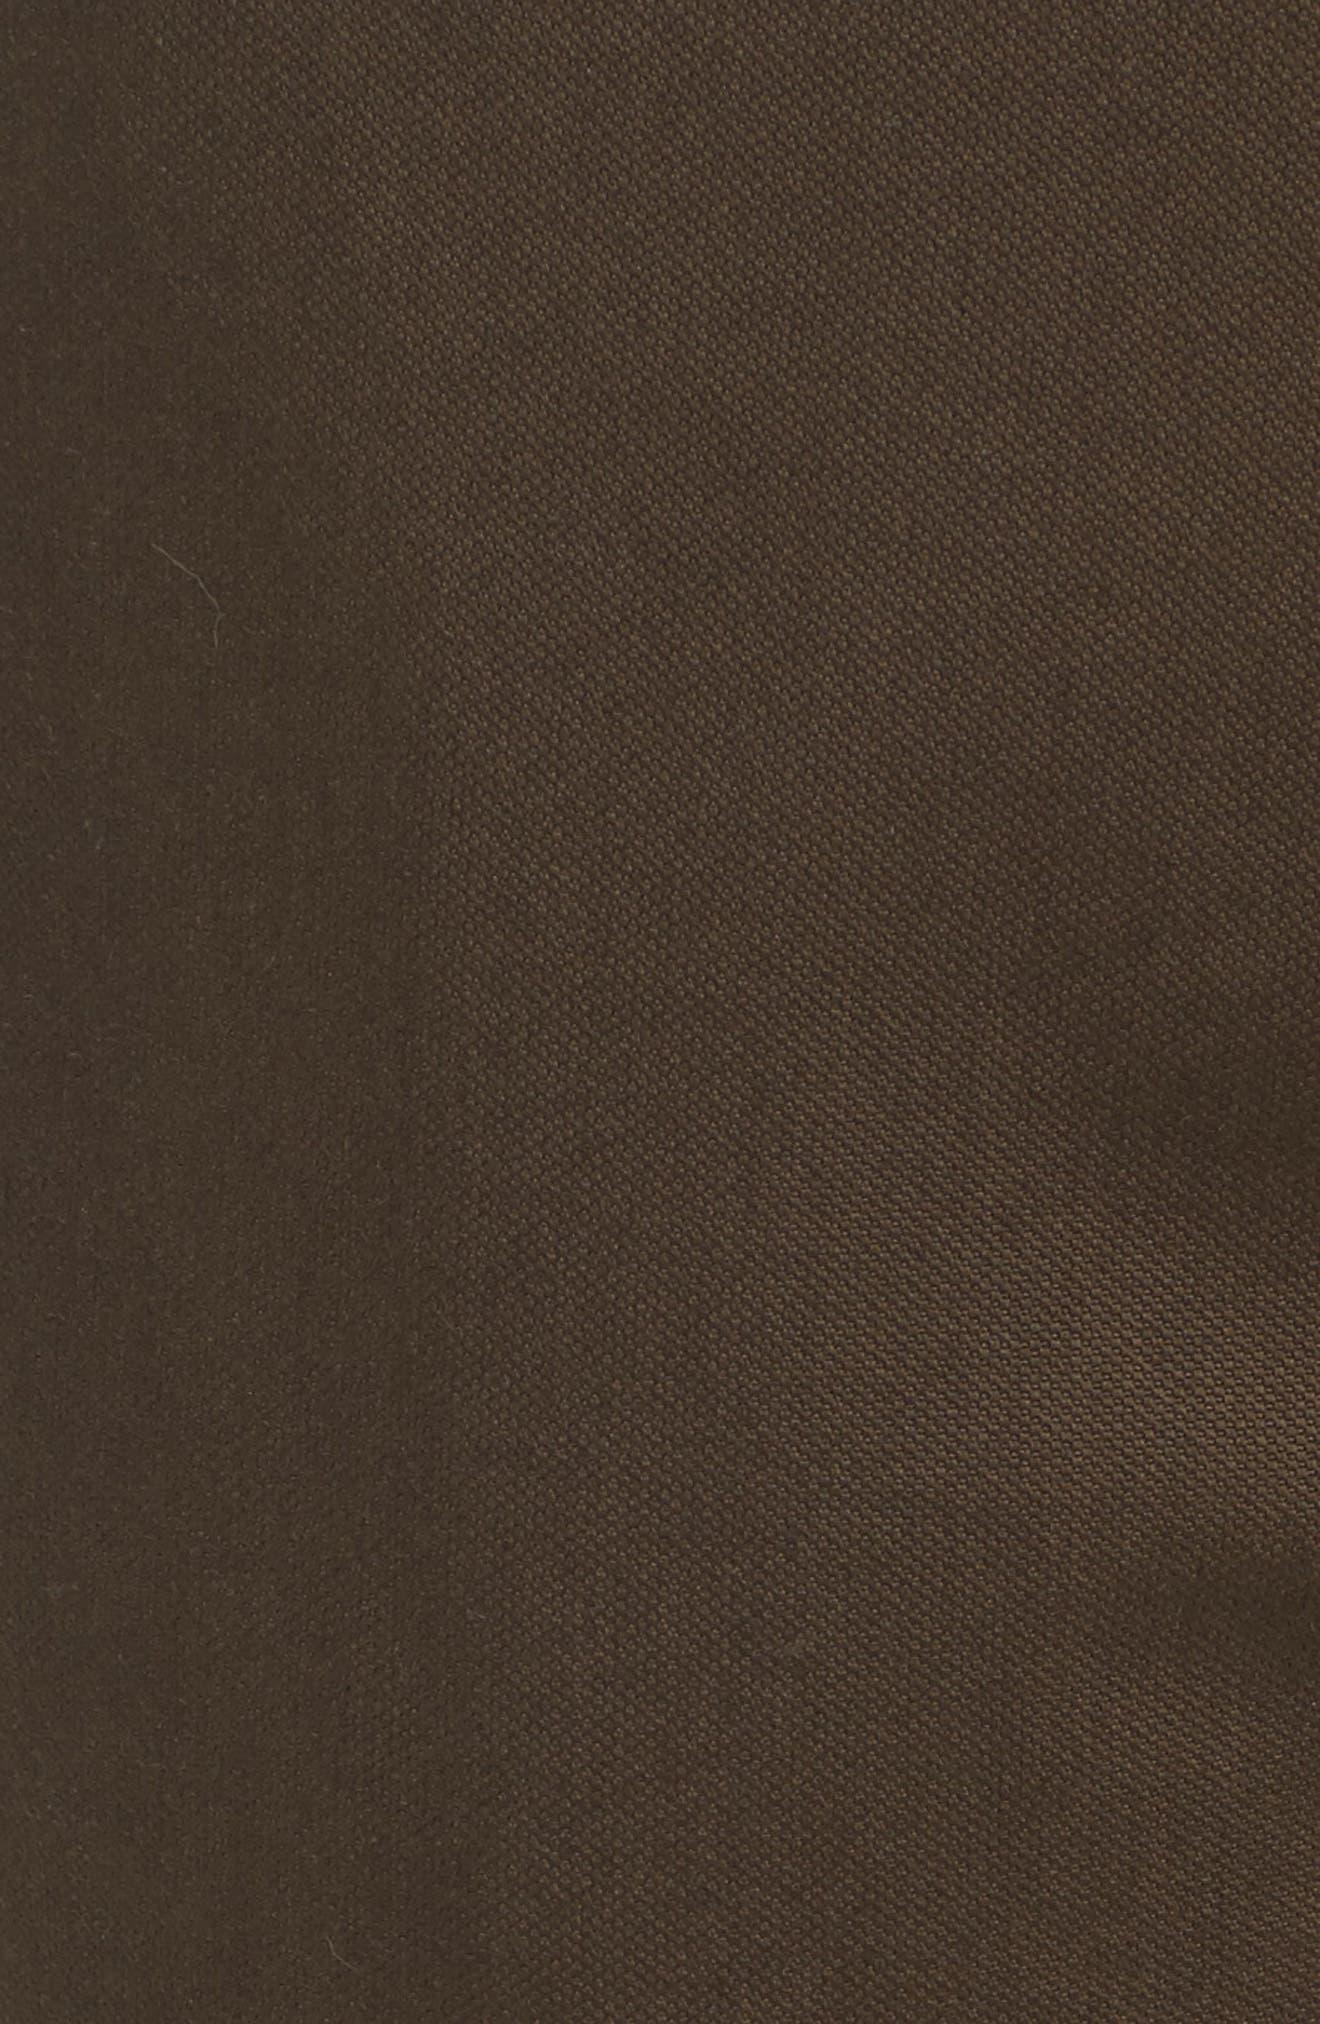 Batho-W Regular Fit Trousers,                             Alternate thumbnail 2, color,                             342